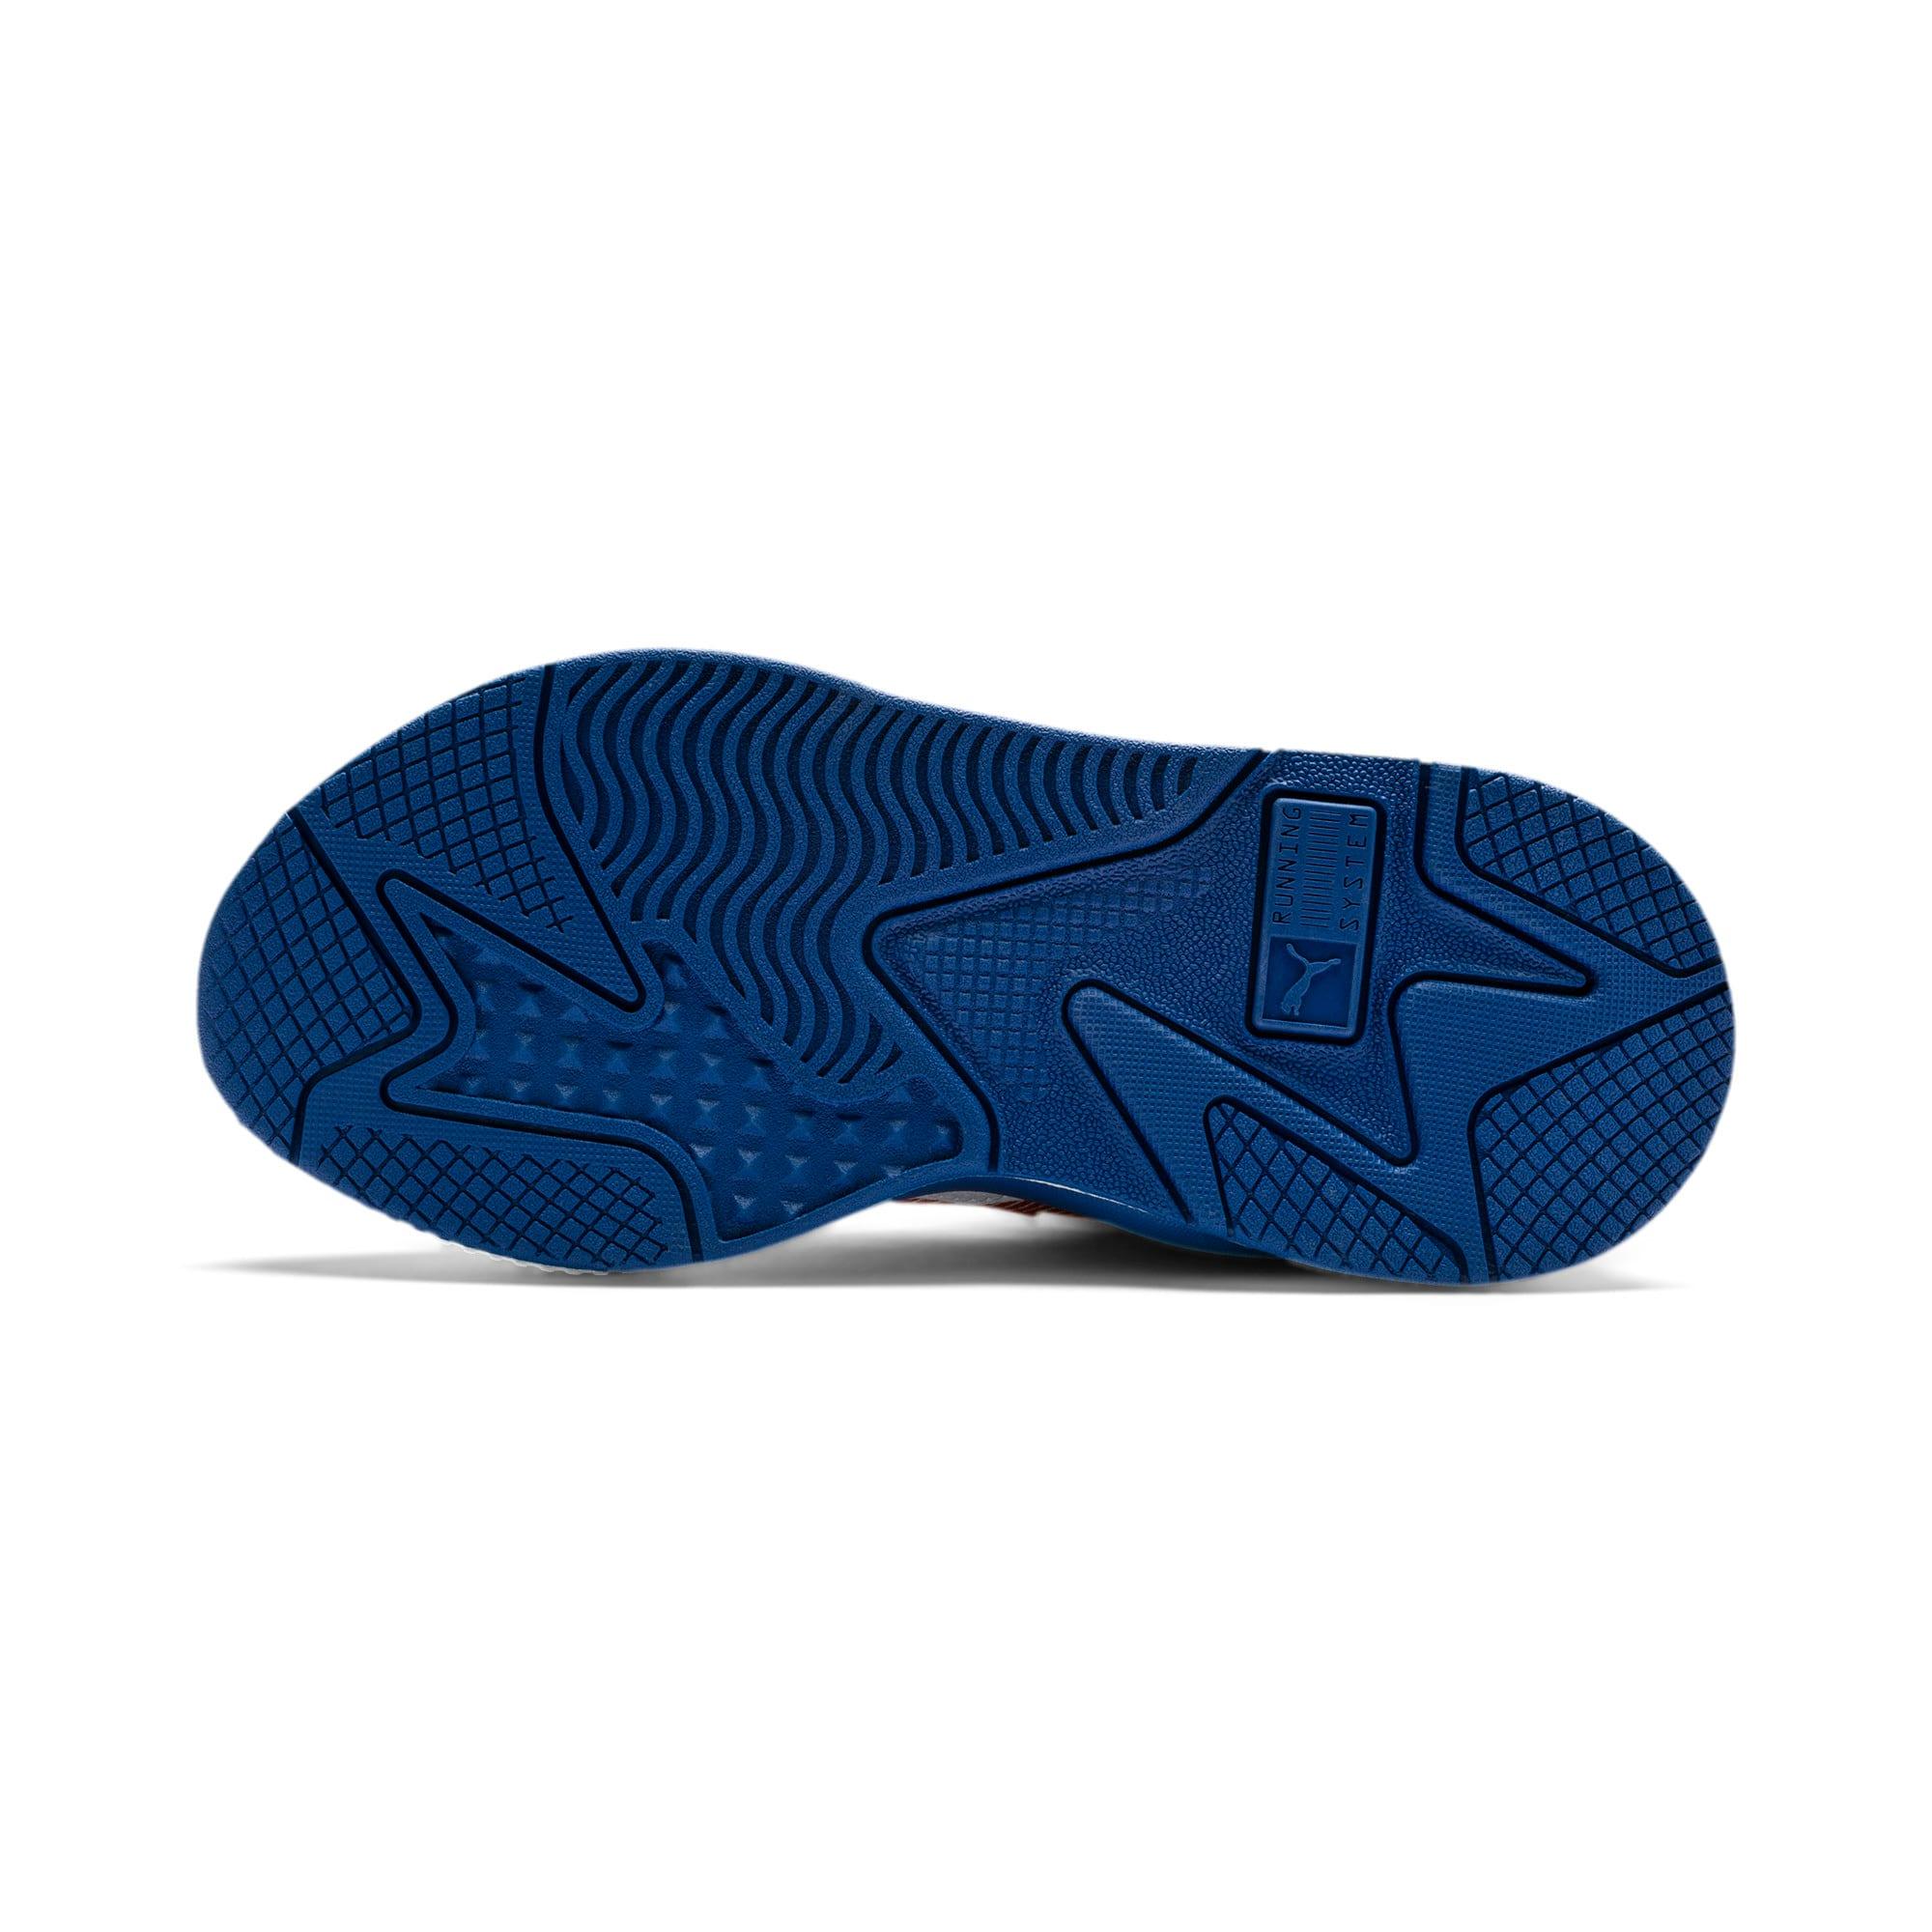 Thumbnail 4 of RS-X Hard Drive Sneakers JR, Puma White-High Risk Red, medium